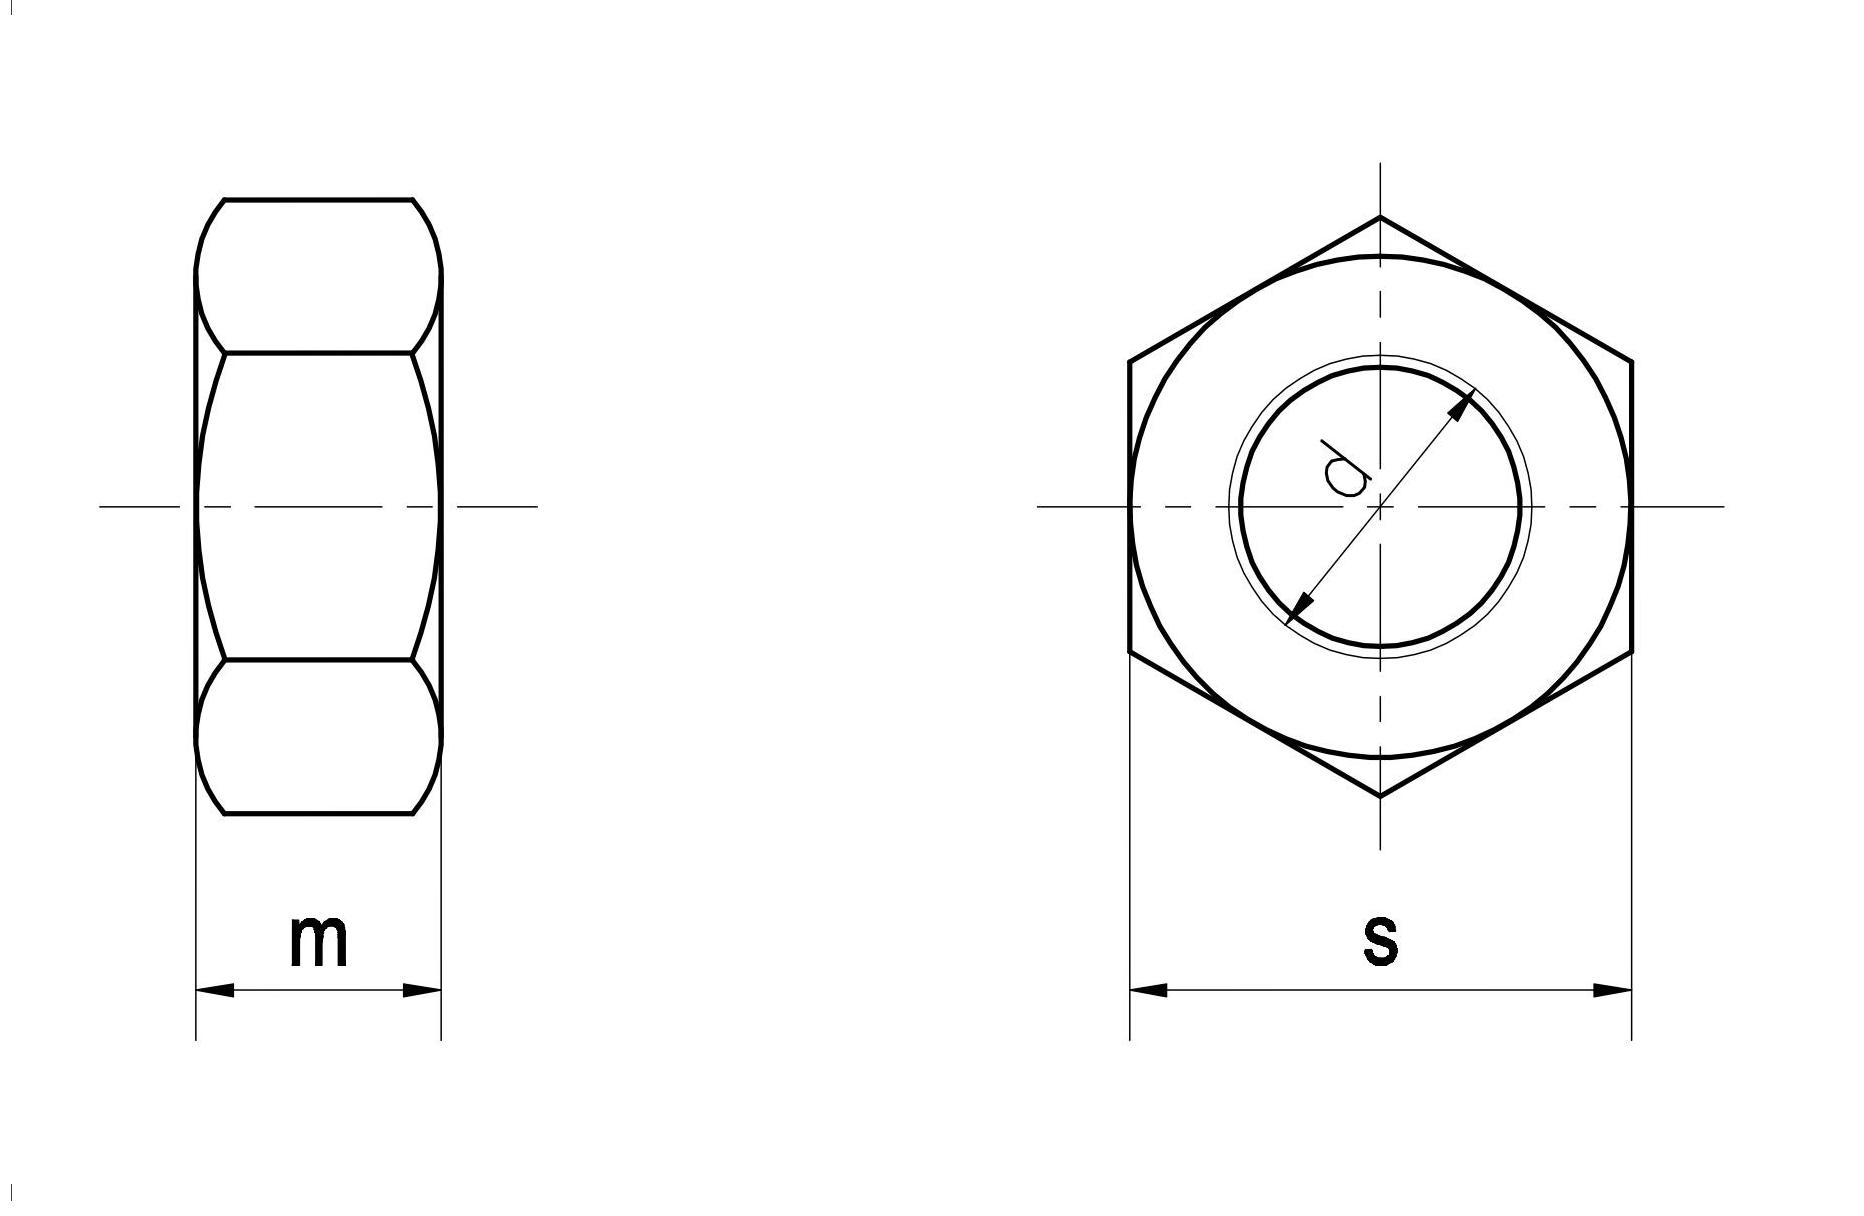 Đai ốc (Ecu) tiêu chuẩn DIN 934